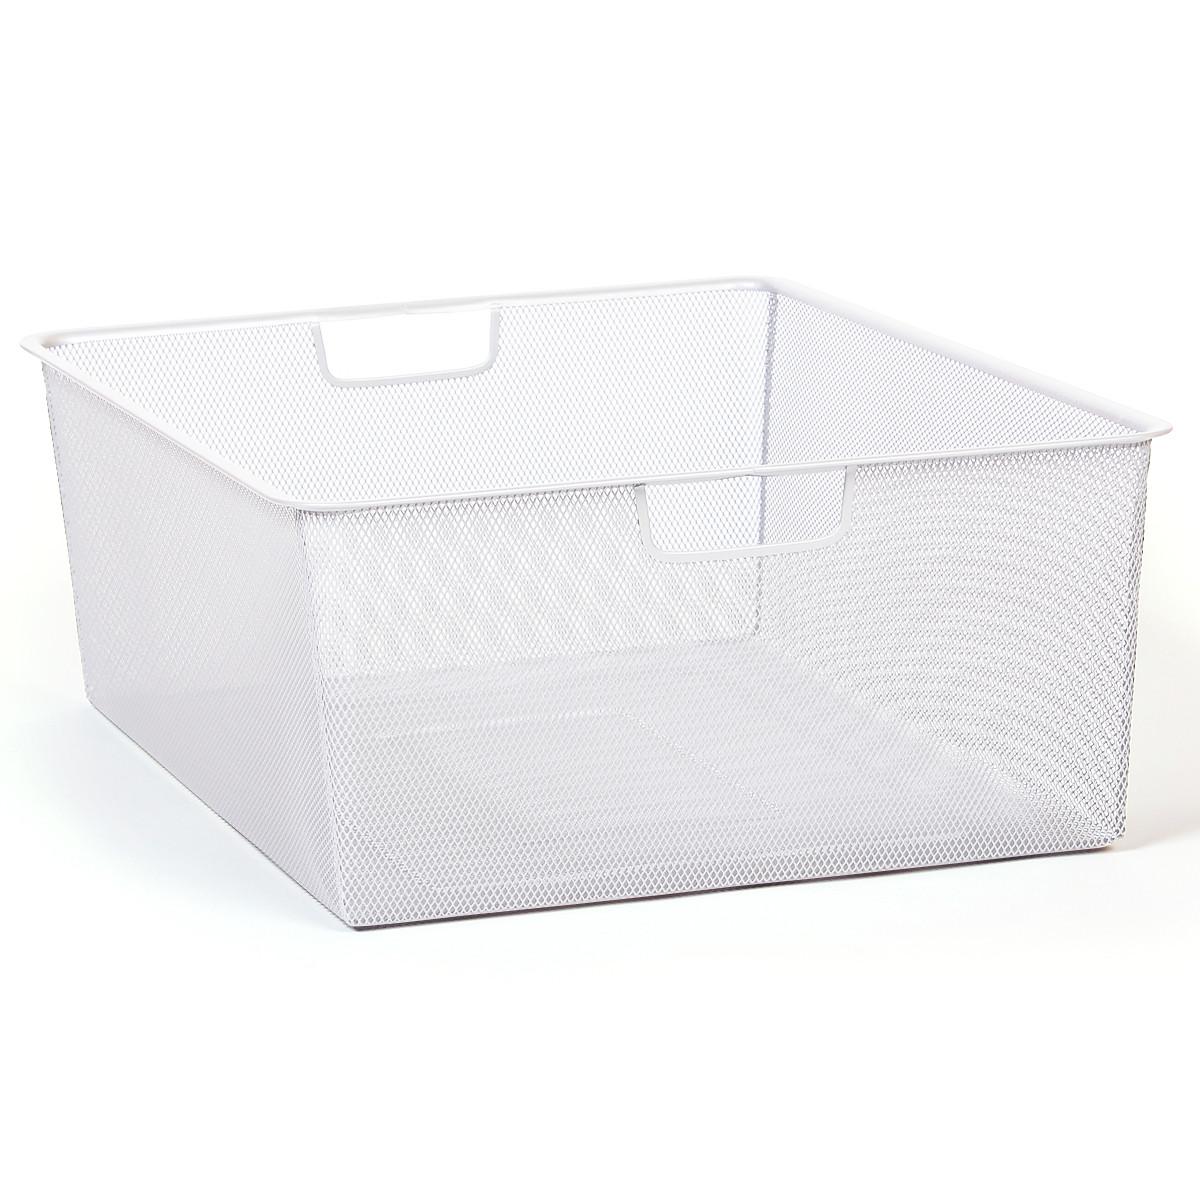 Мелкосетчатая корзина для гардеробной Larvij белая L9560WH(N)